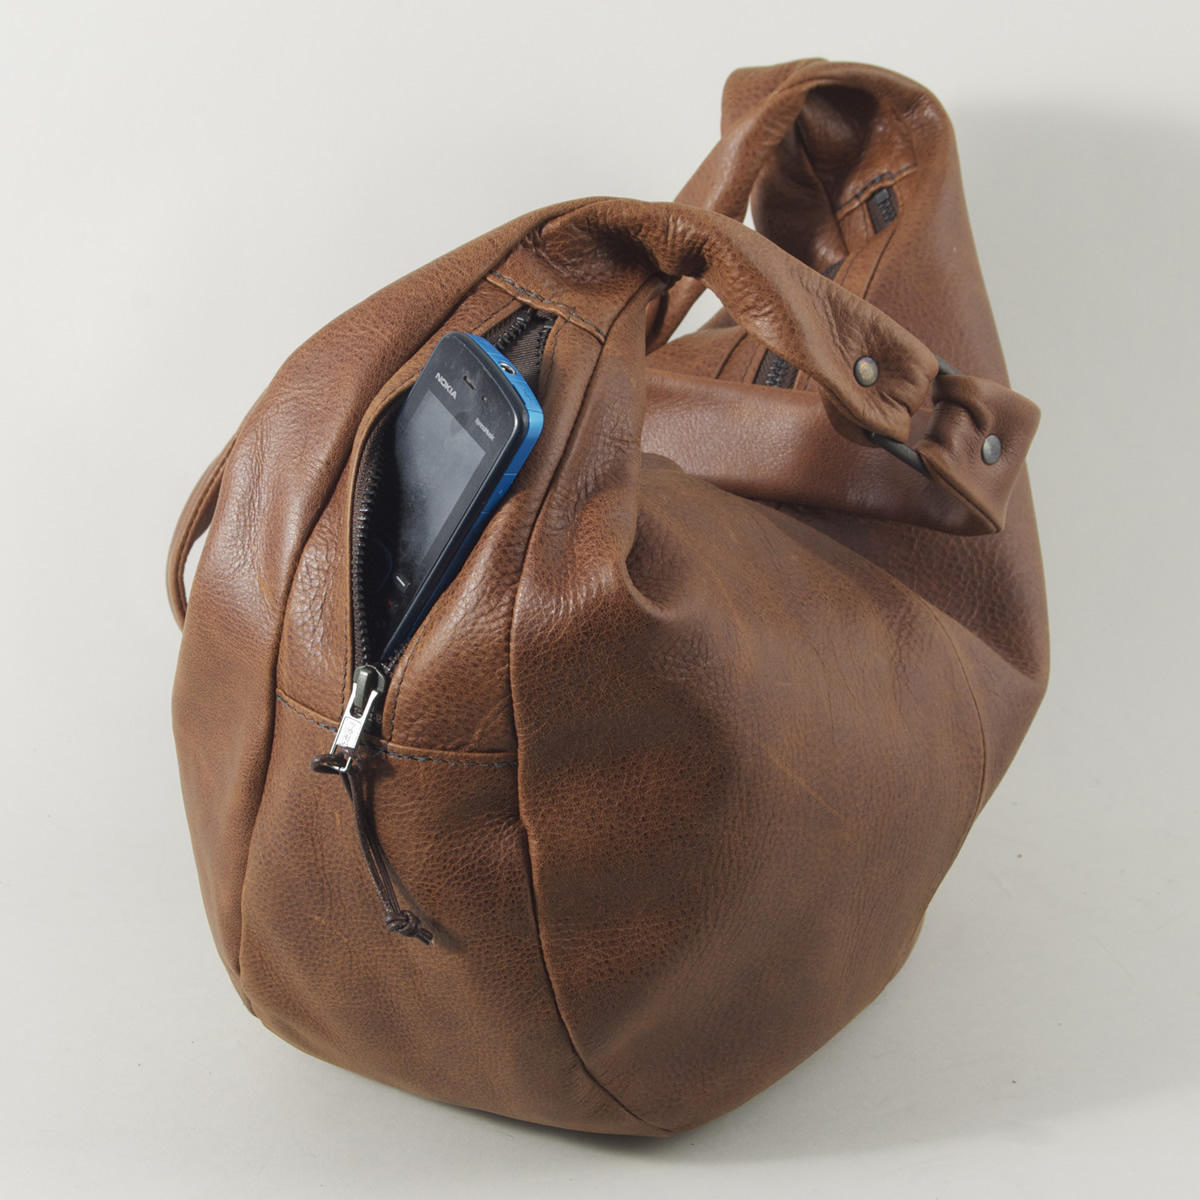 The Hammock Bag